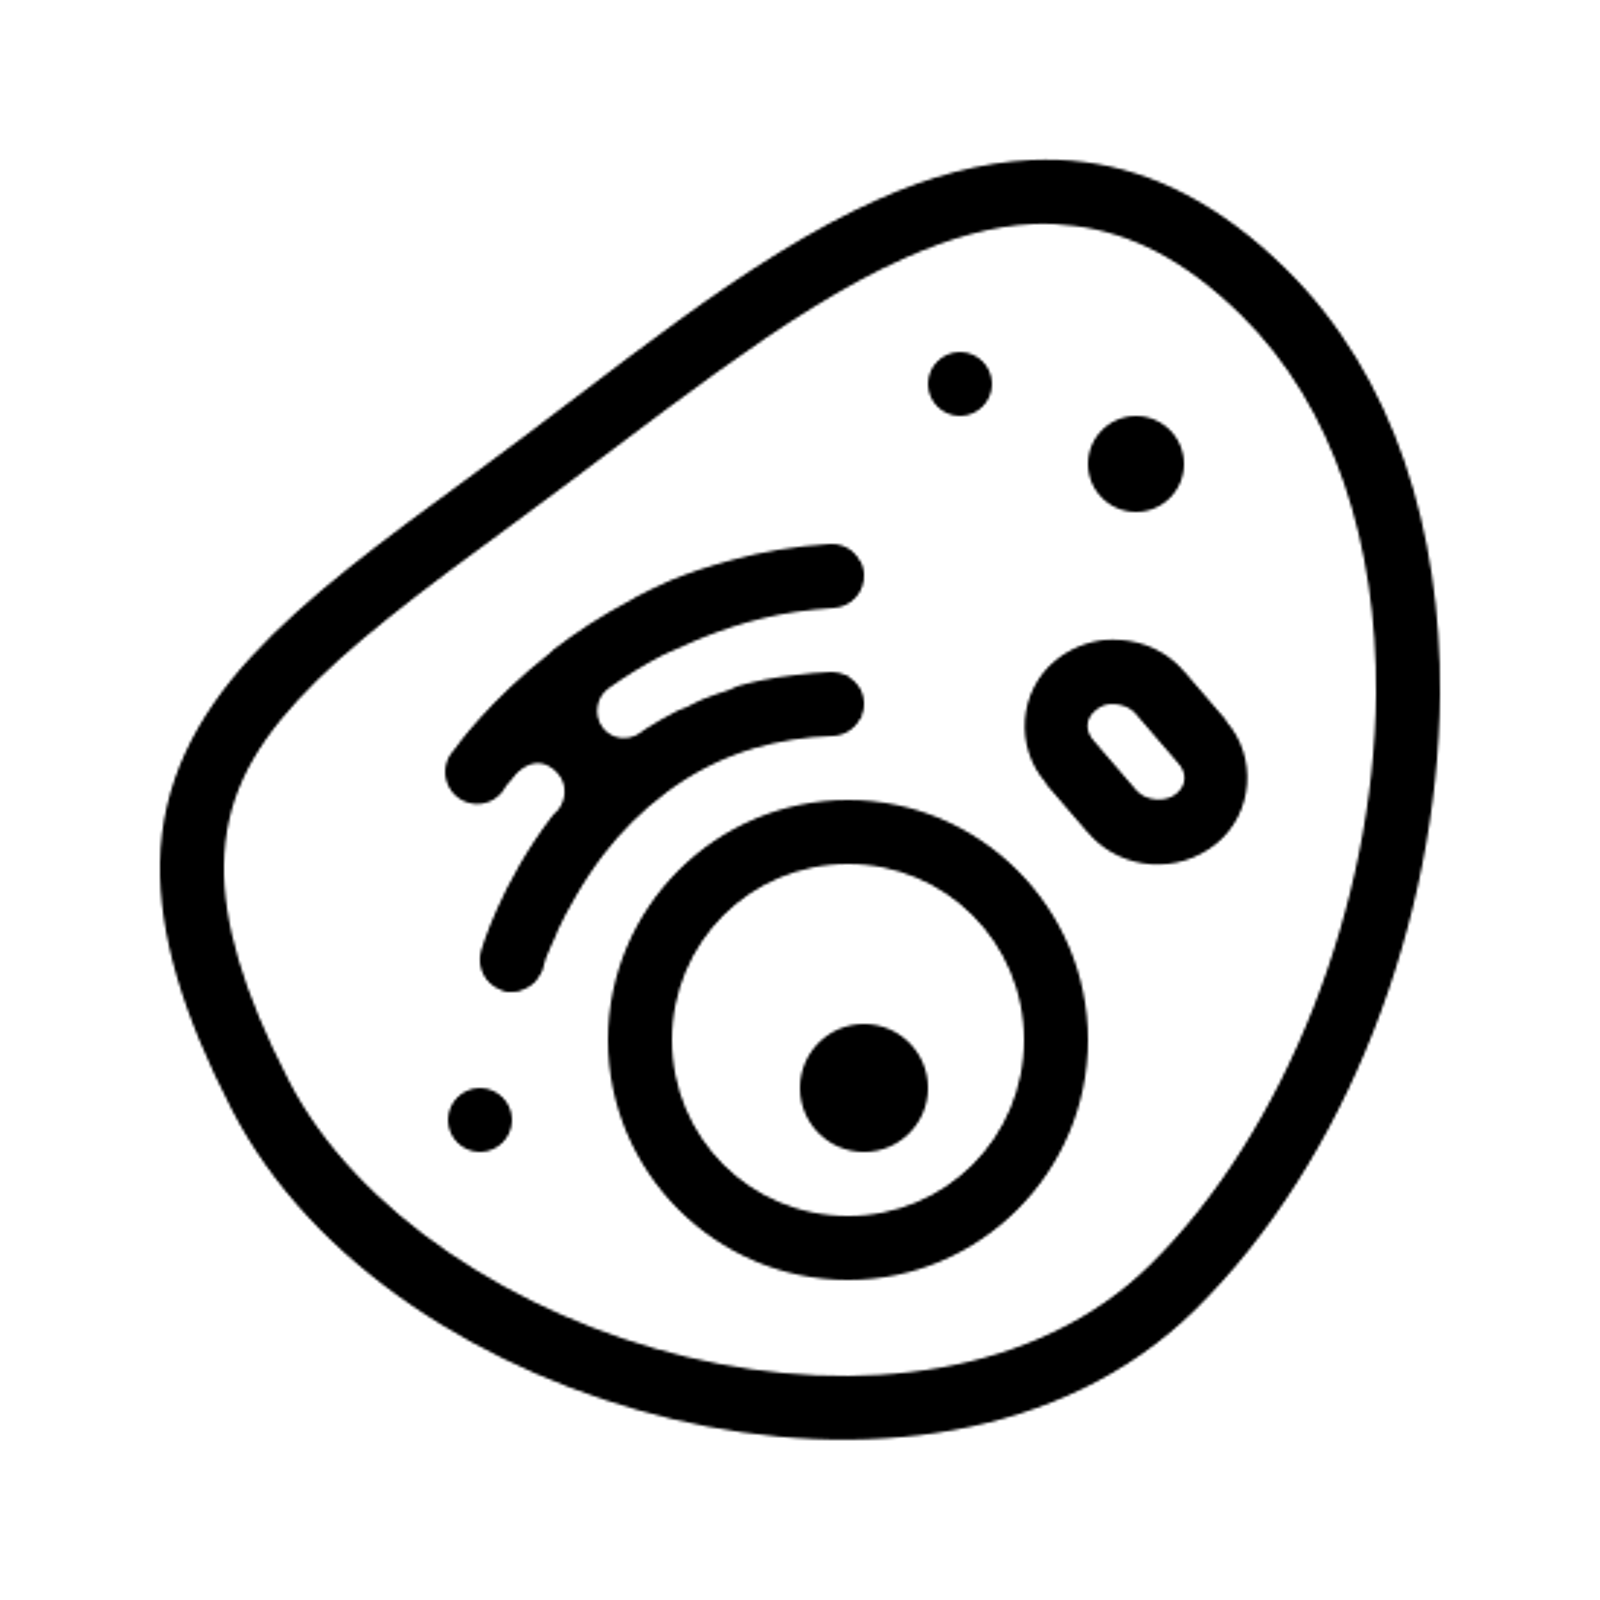 真核细胞 icon